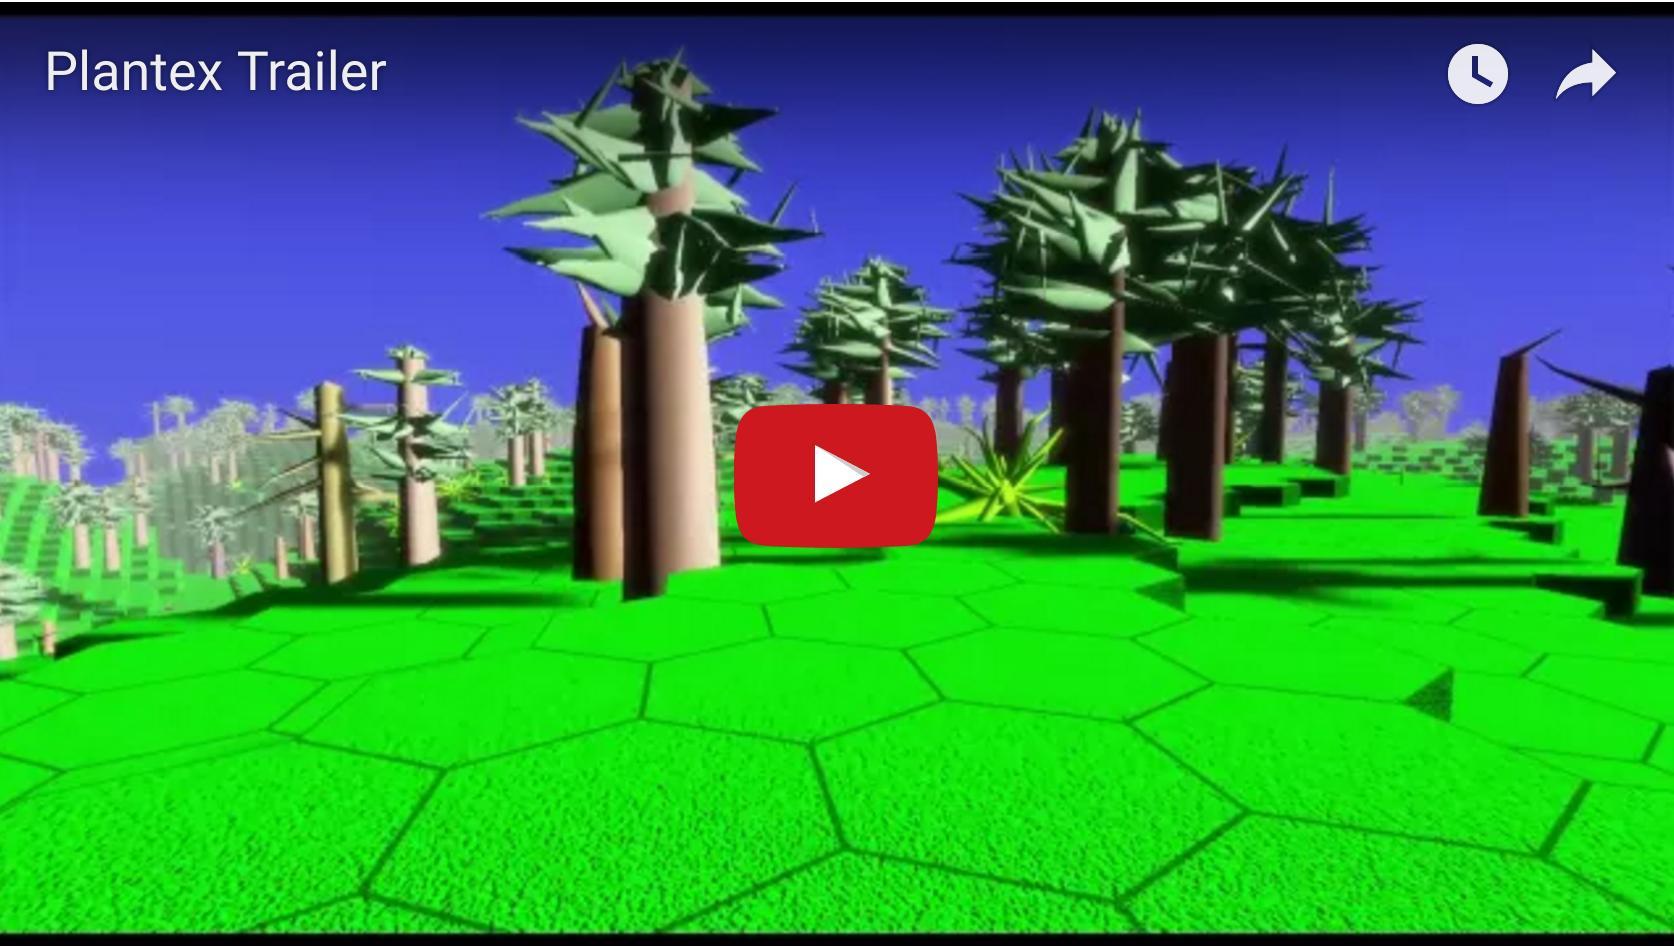 Plantex Trailer